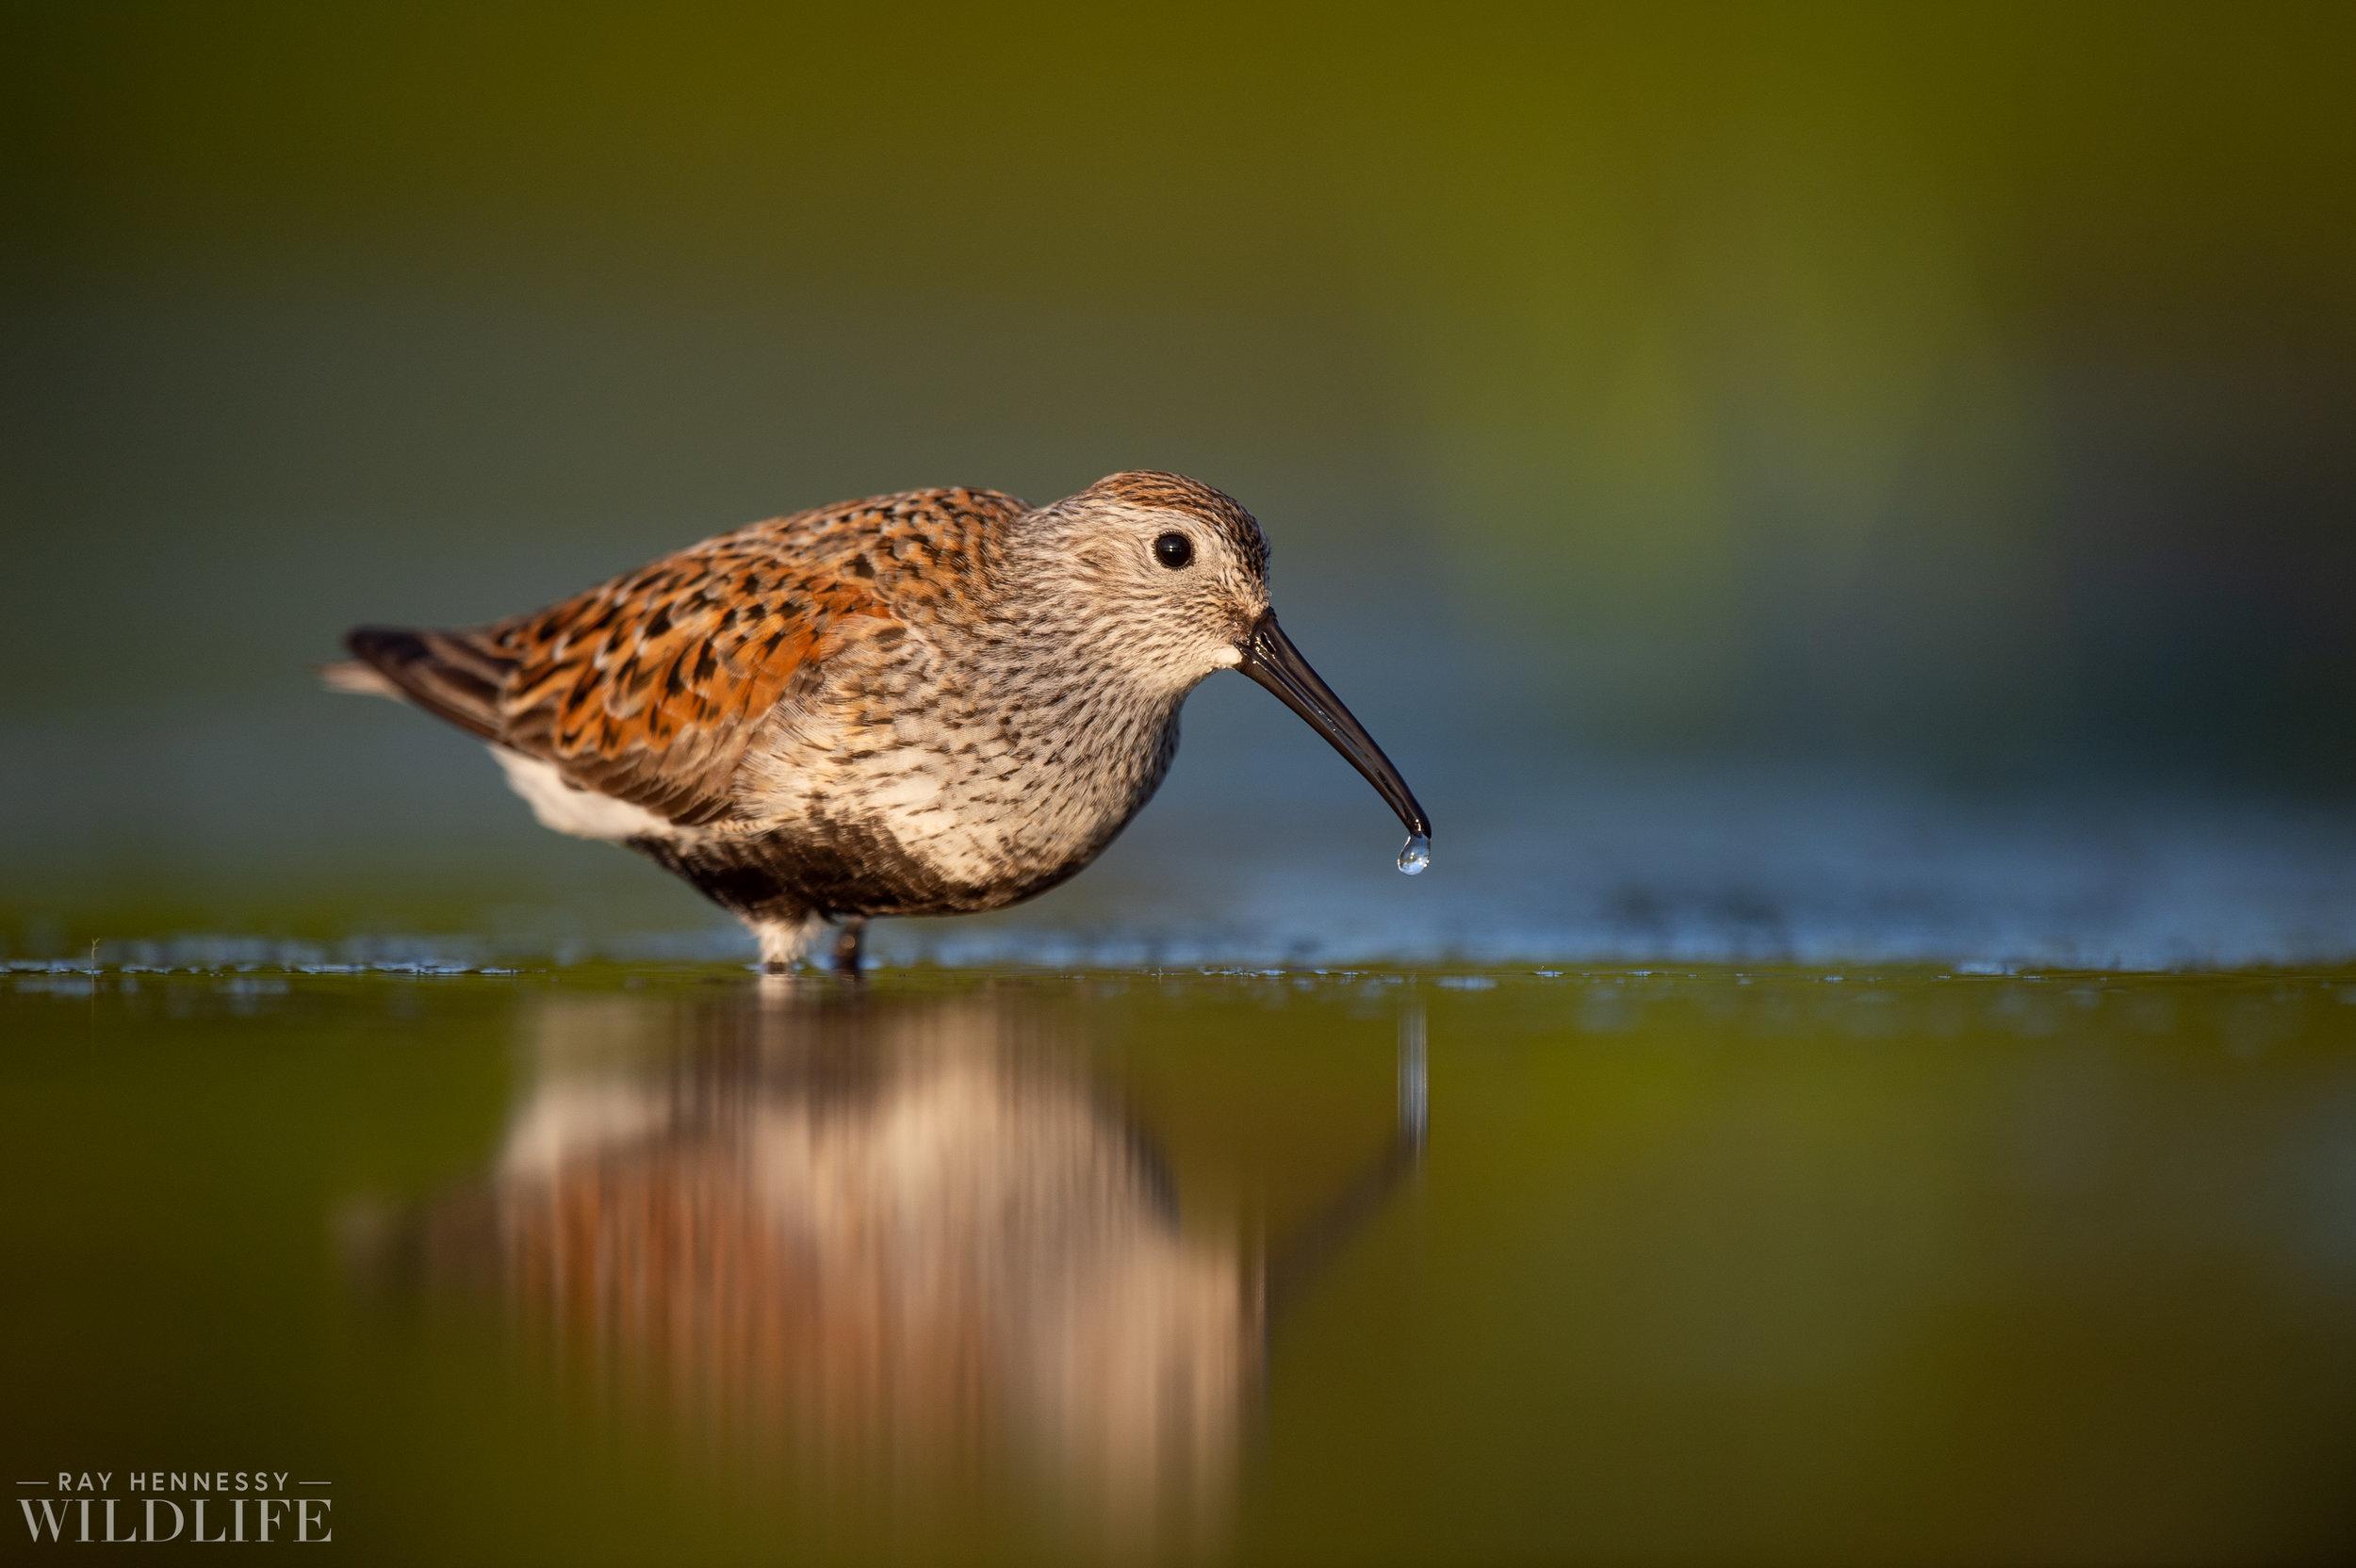 015_shorebirds-prothonotary-warbler.jpg